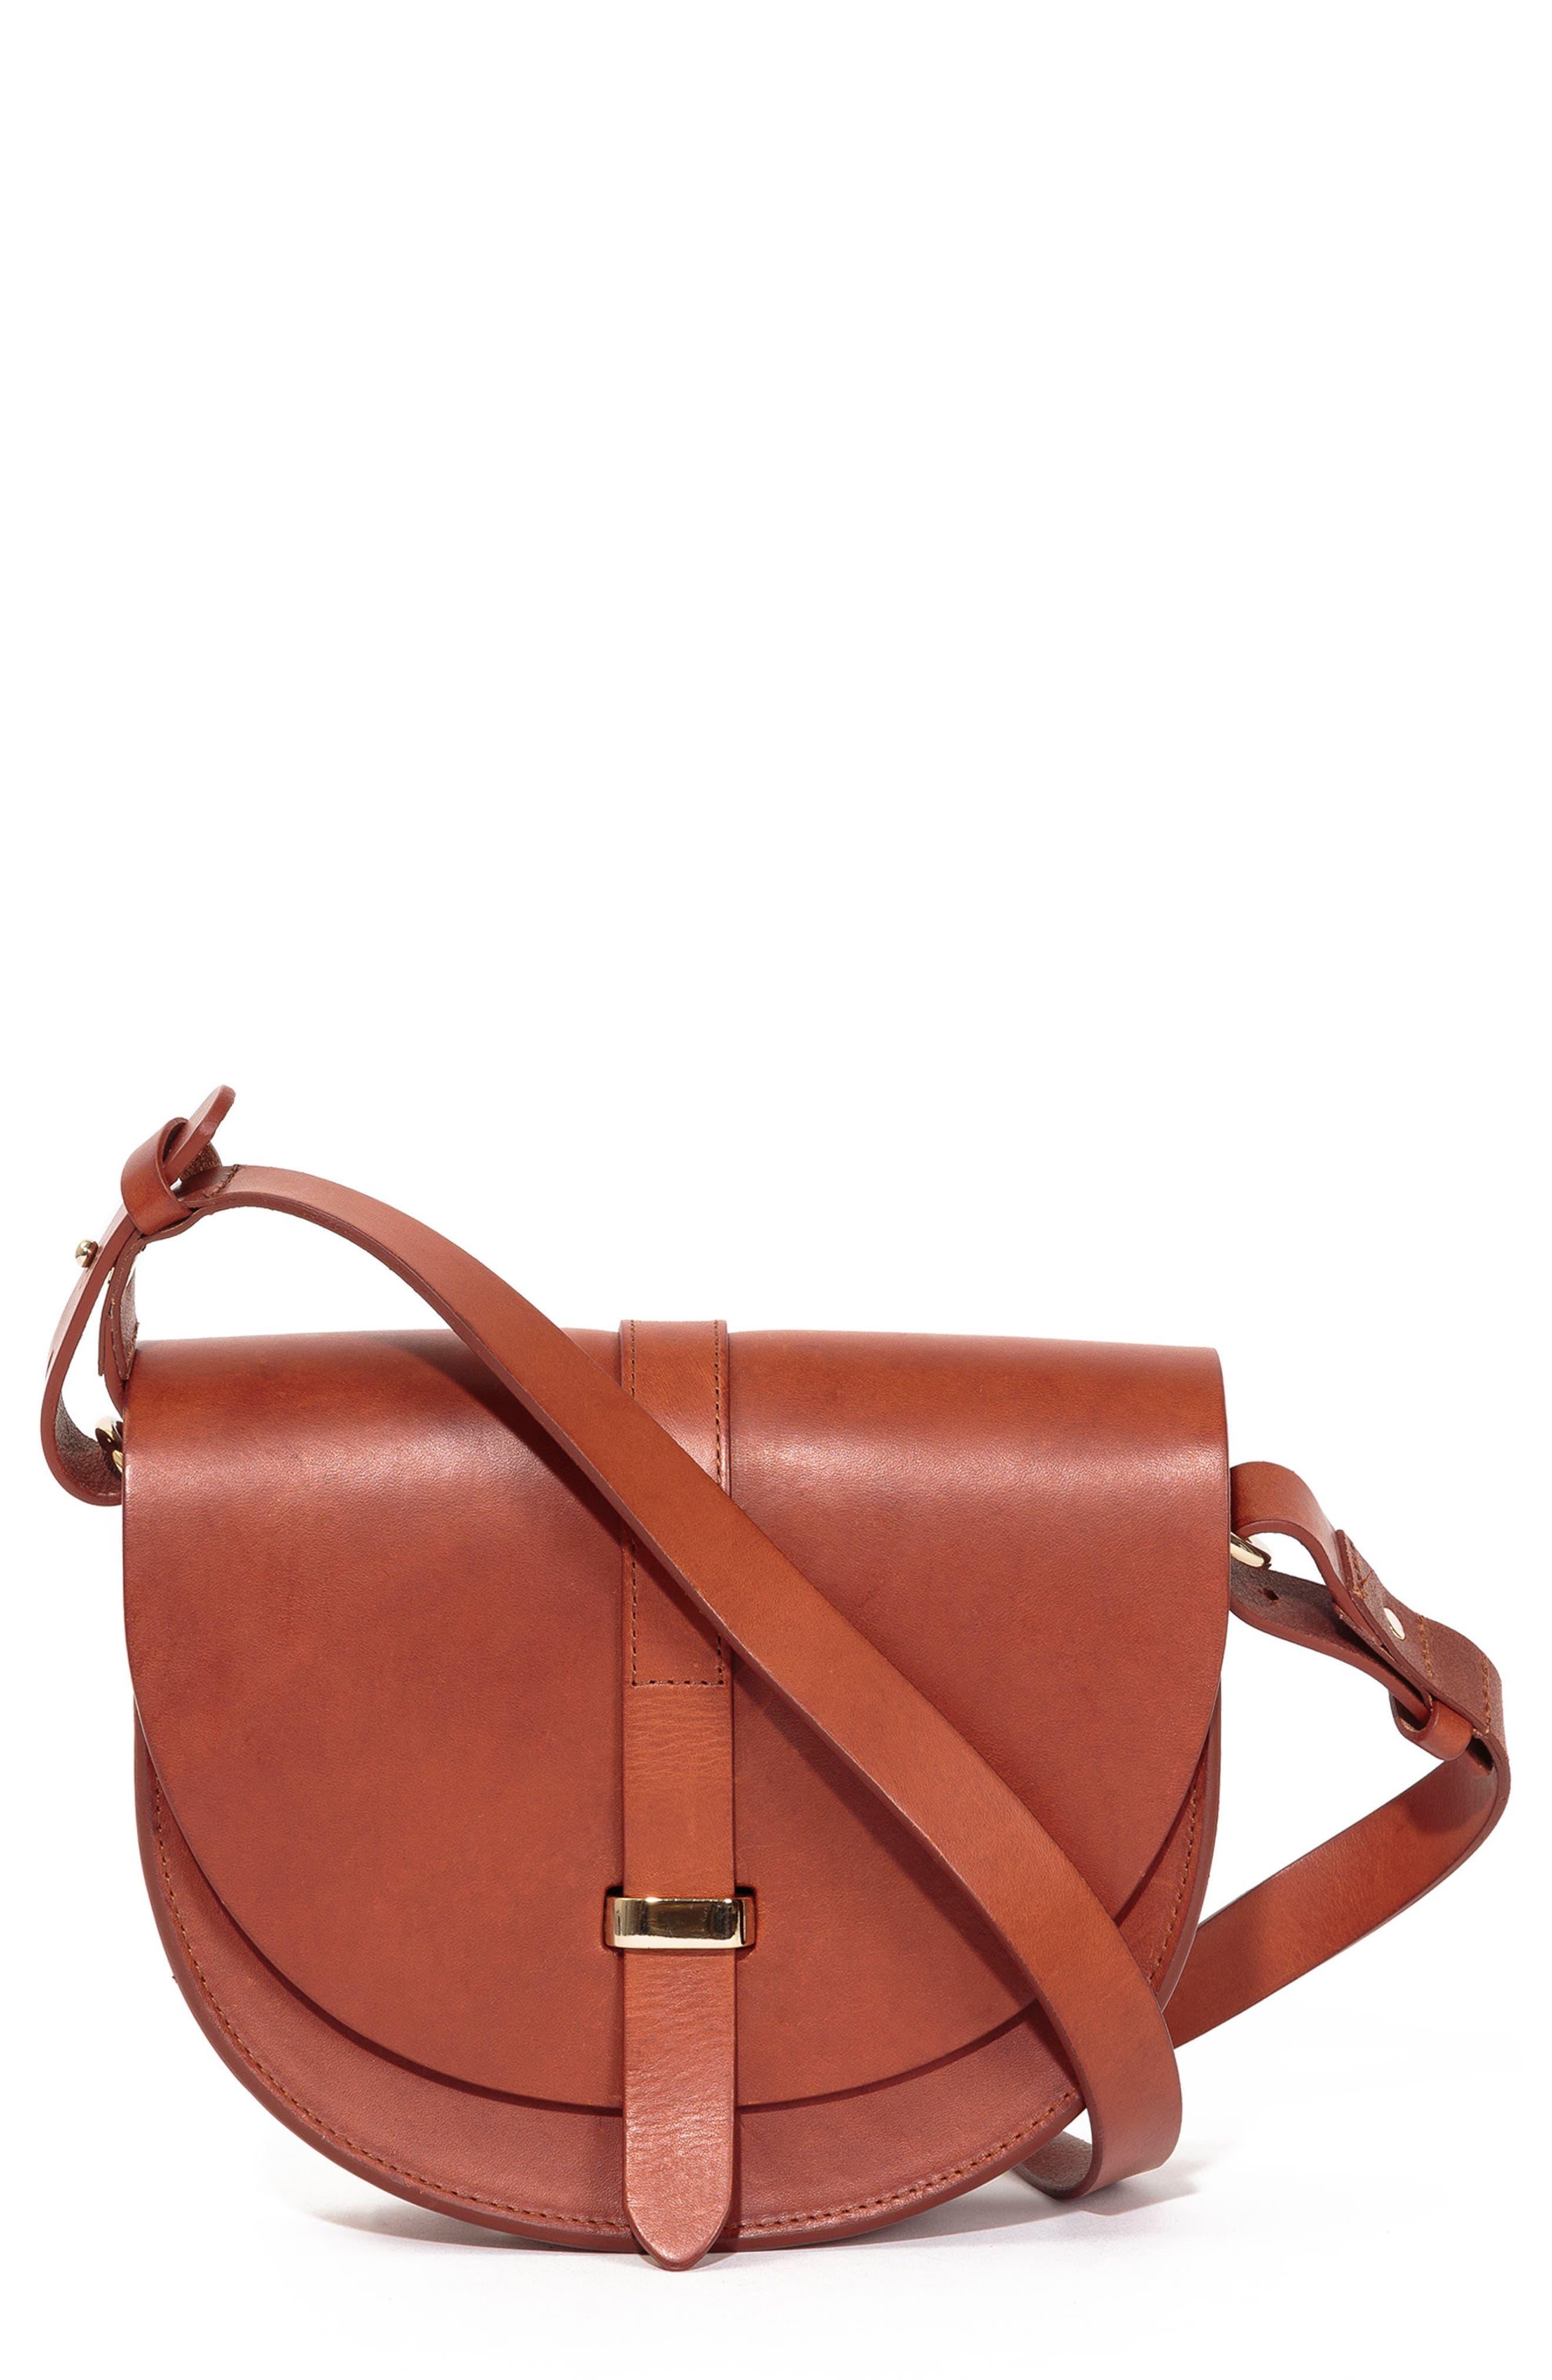 Claude Crossbody Bag,                             Main thumbnail 1, color,                             Chocolate